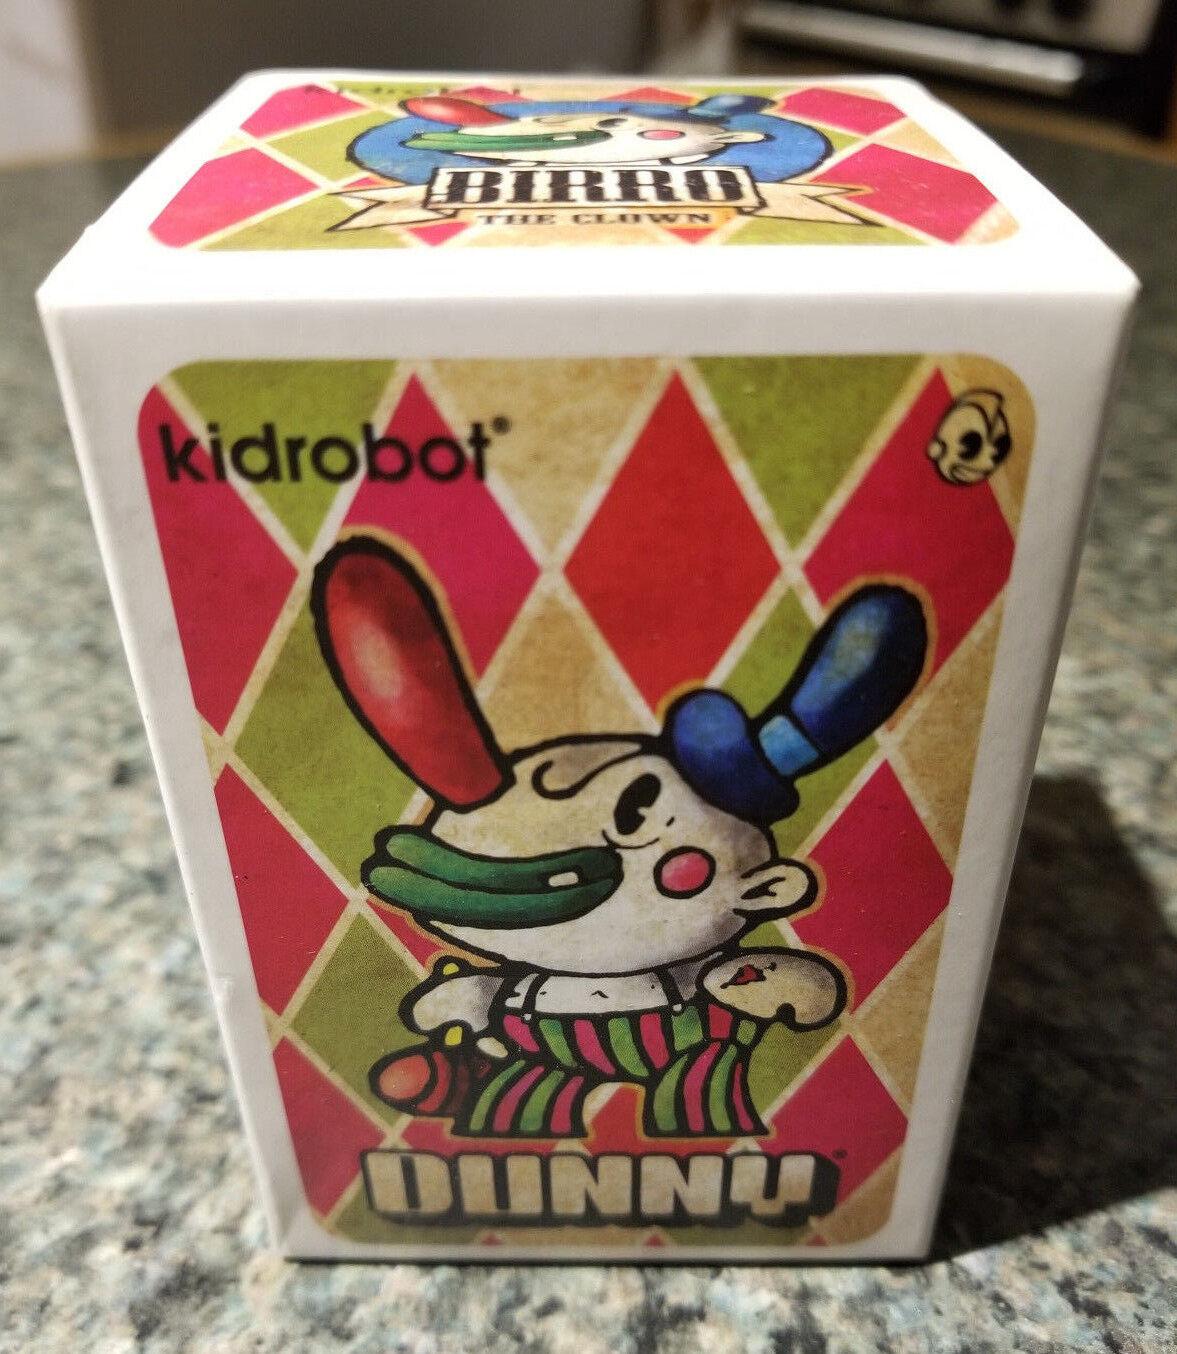 Kidrobot DUNNY Birro Clown CHAUSKOSIS Mexico DRUNK Caravan Urban Vinyl Figure